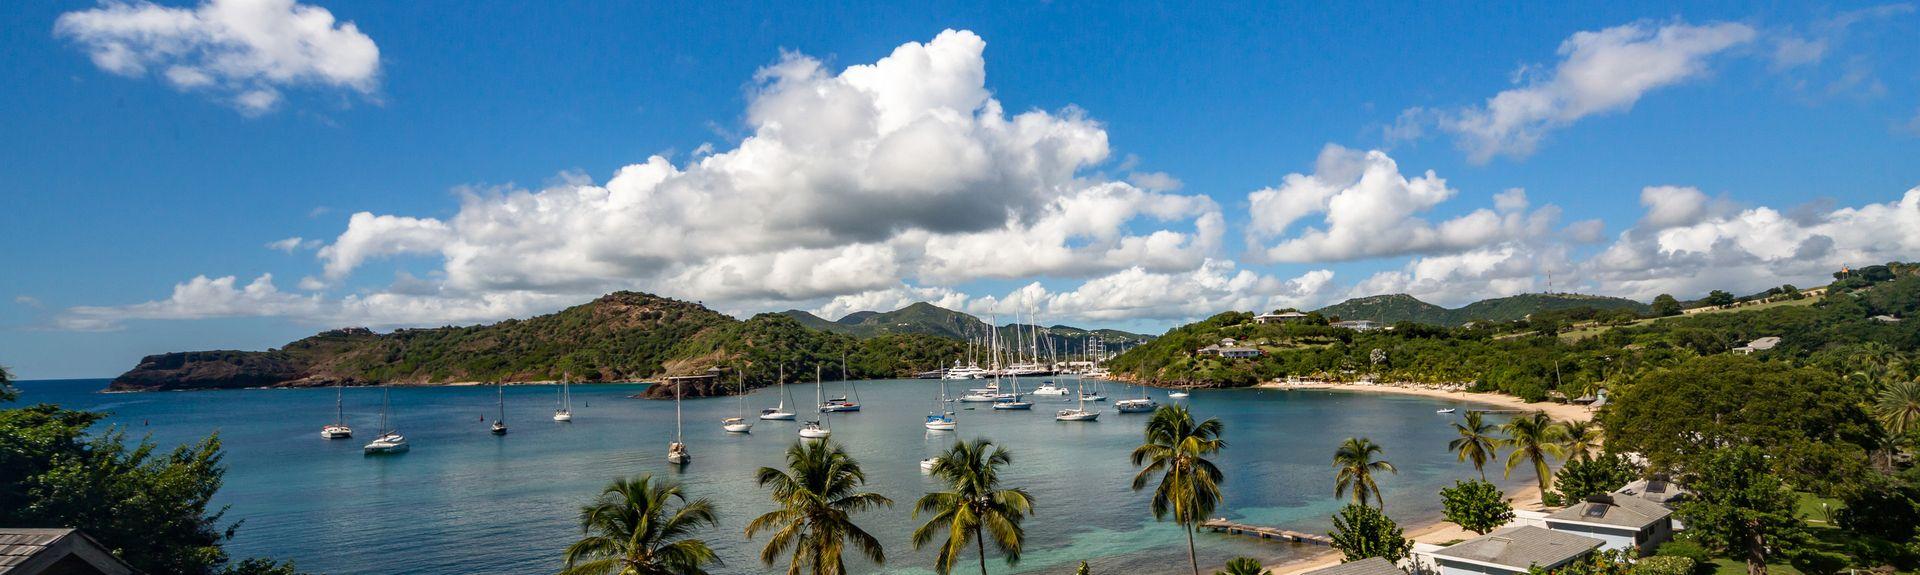 Darkwood Beach, Bolans, Antigua, Antigua and Barbuda